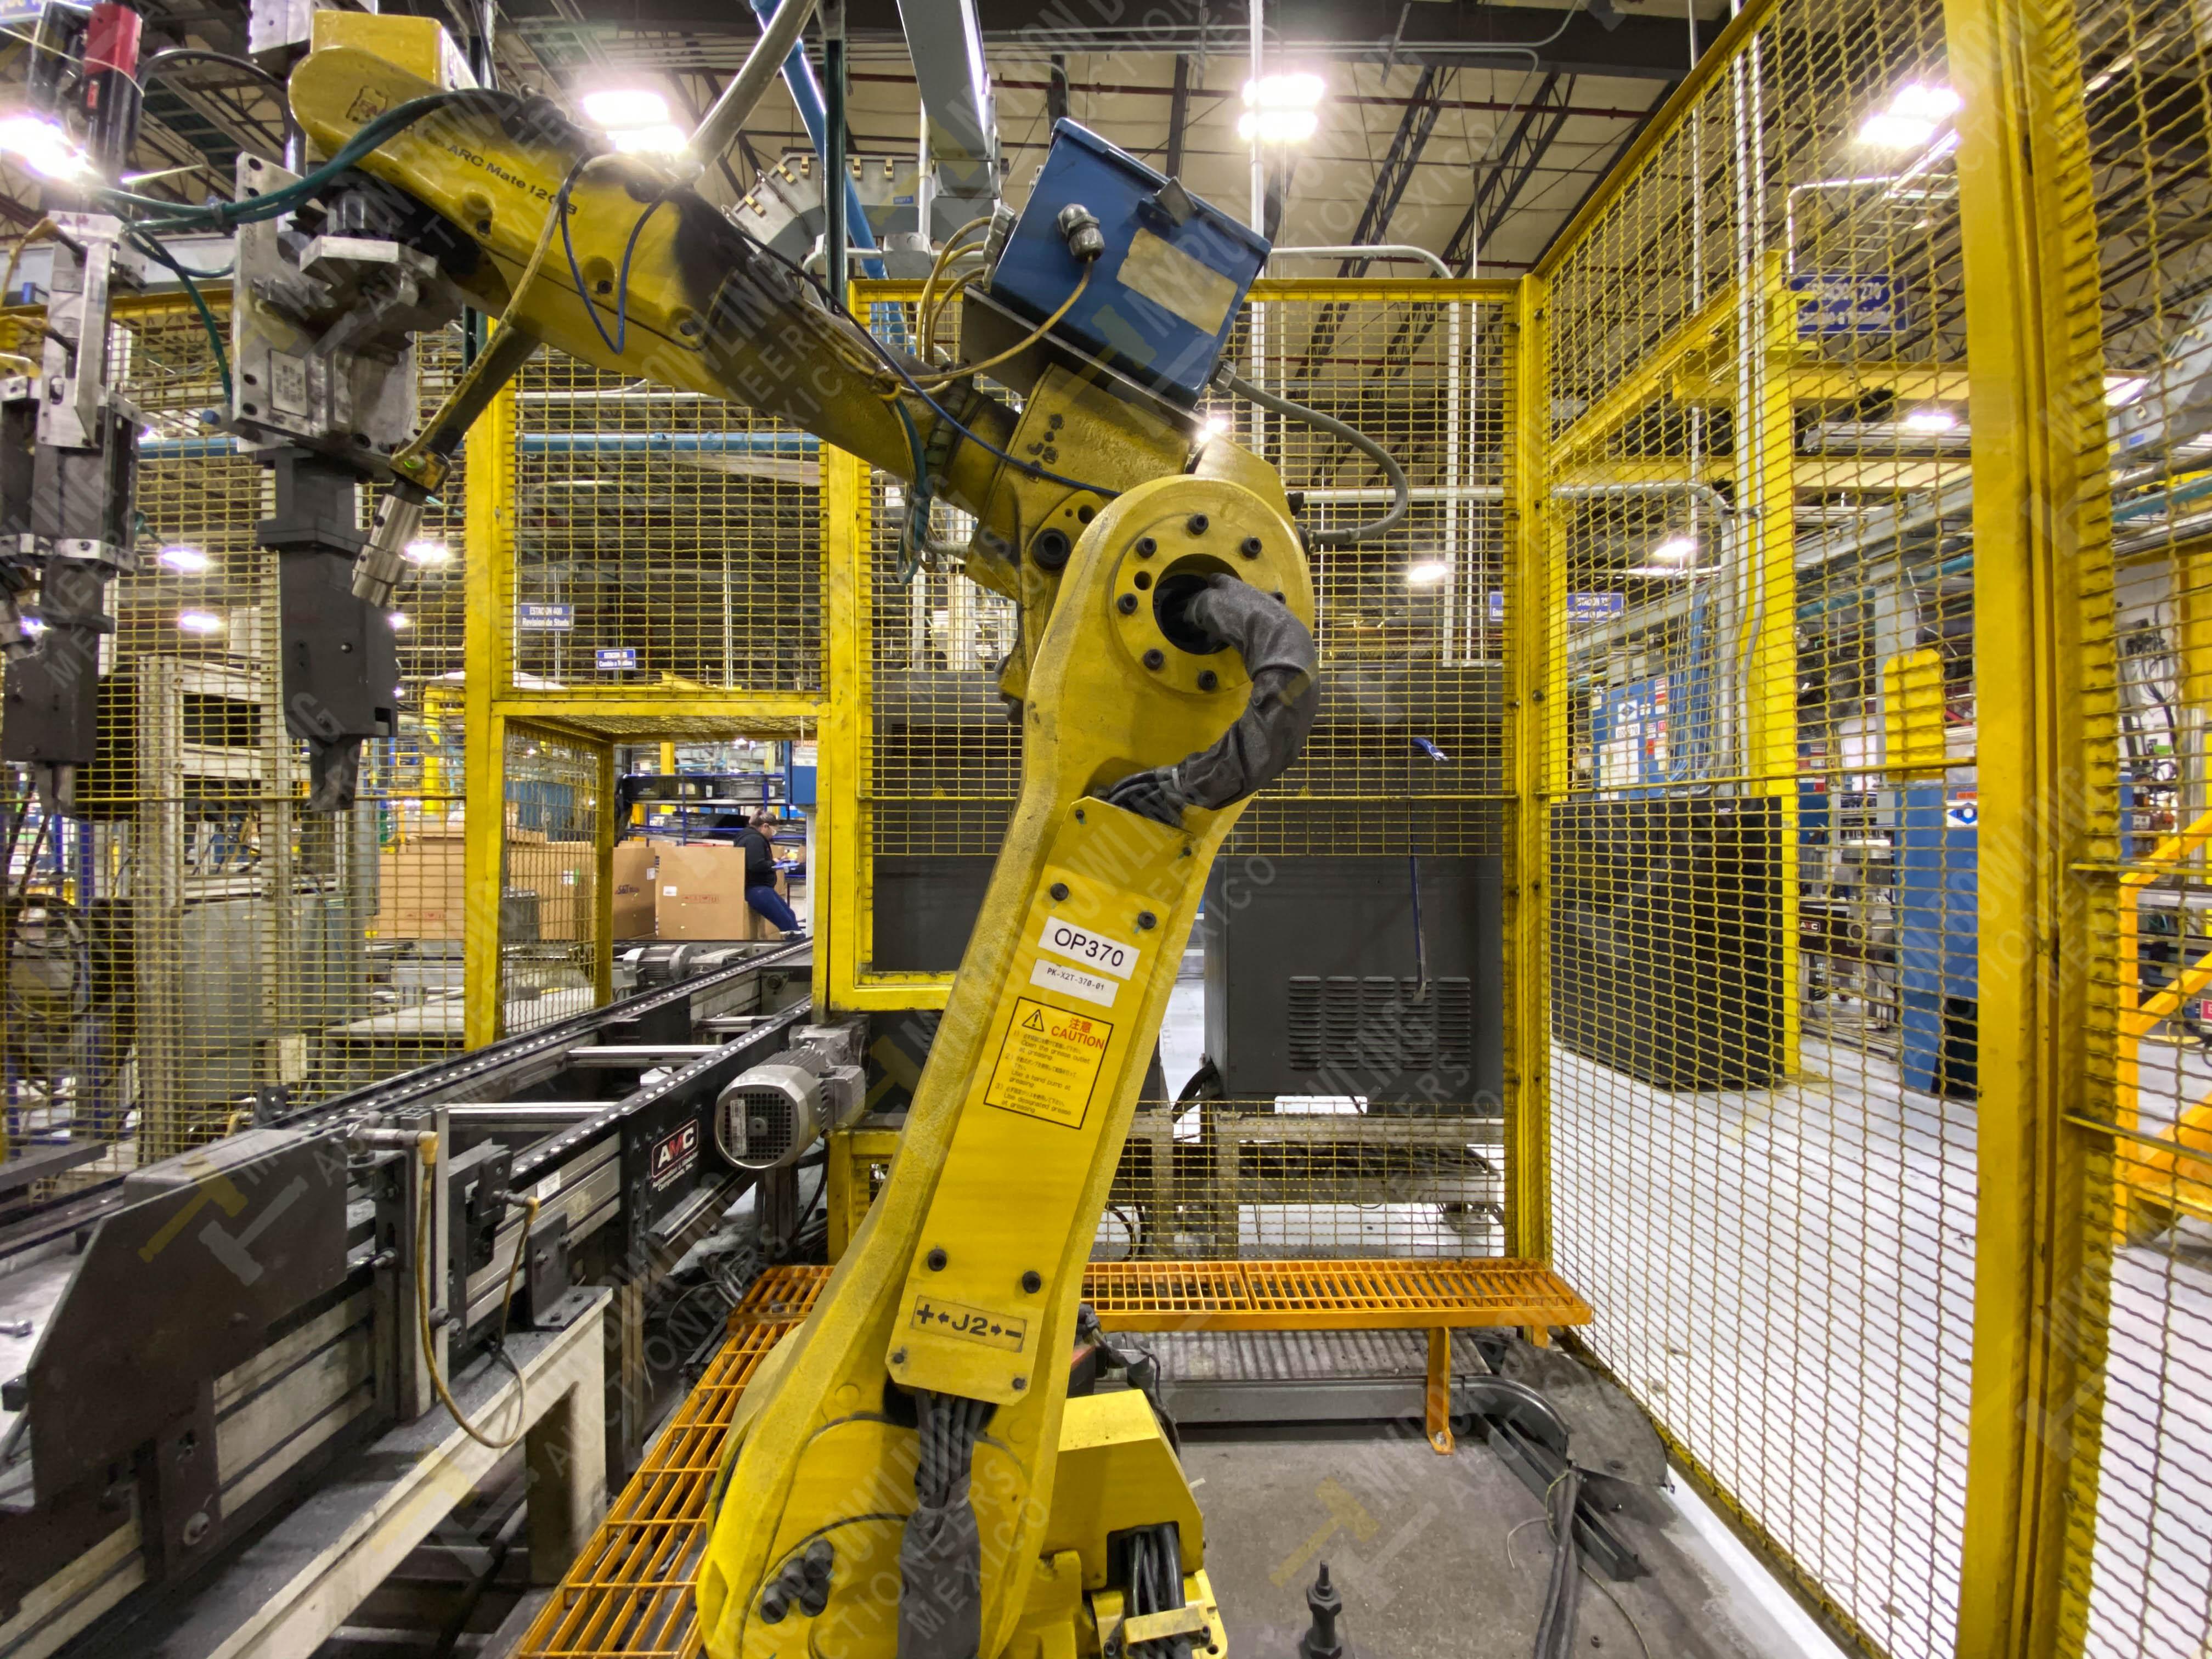 Robot con capacidad de carga de 15-30 Kg, controlador de robot y teach pendant